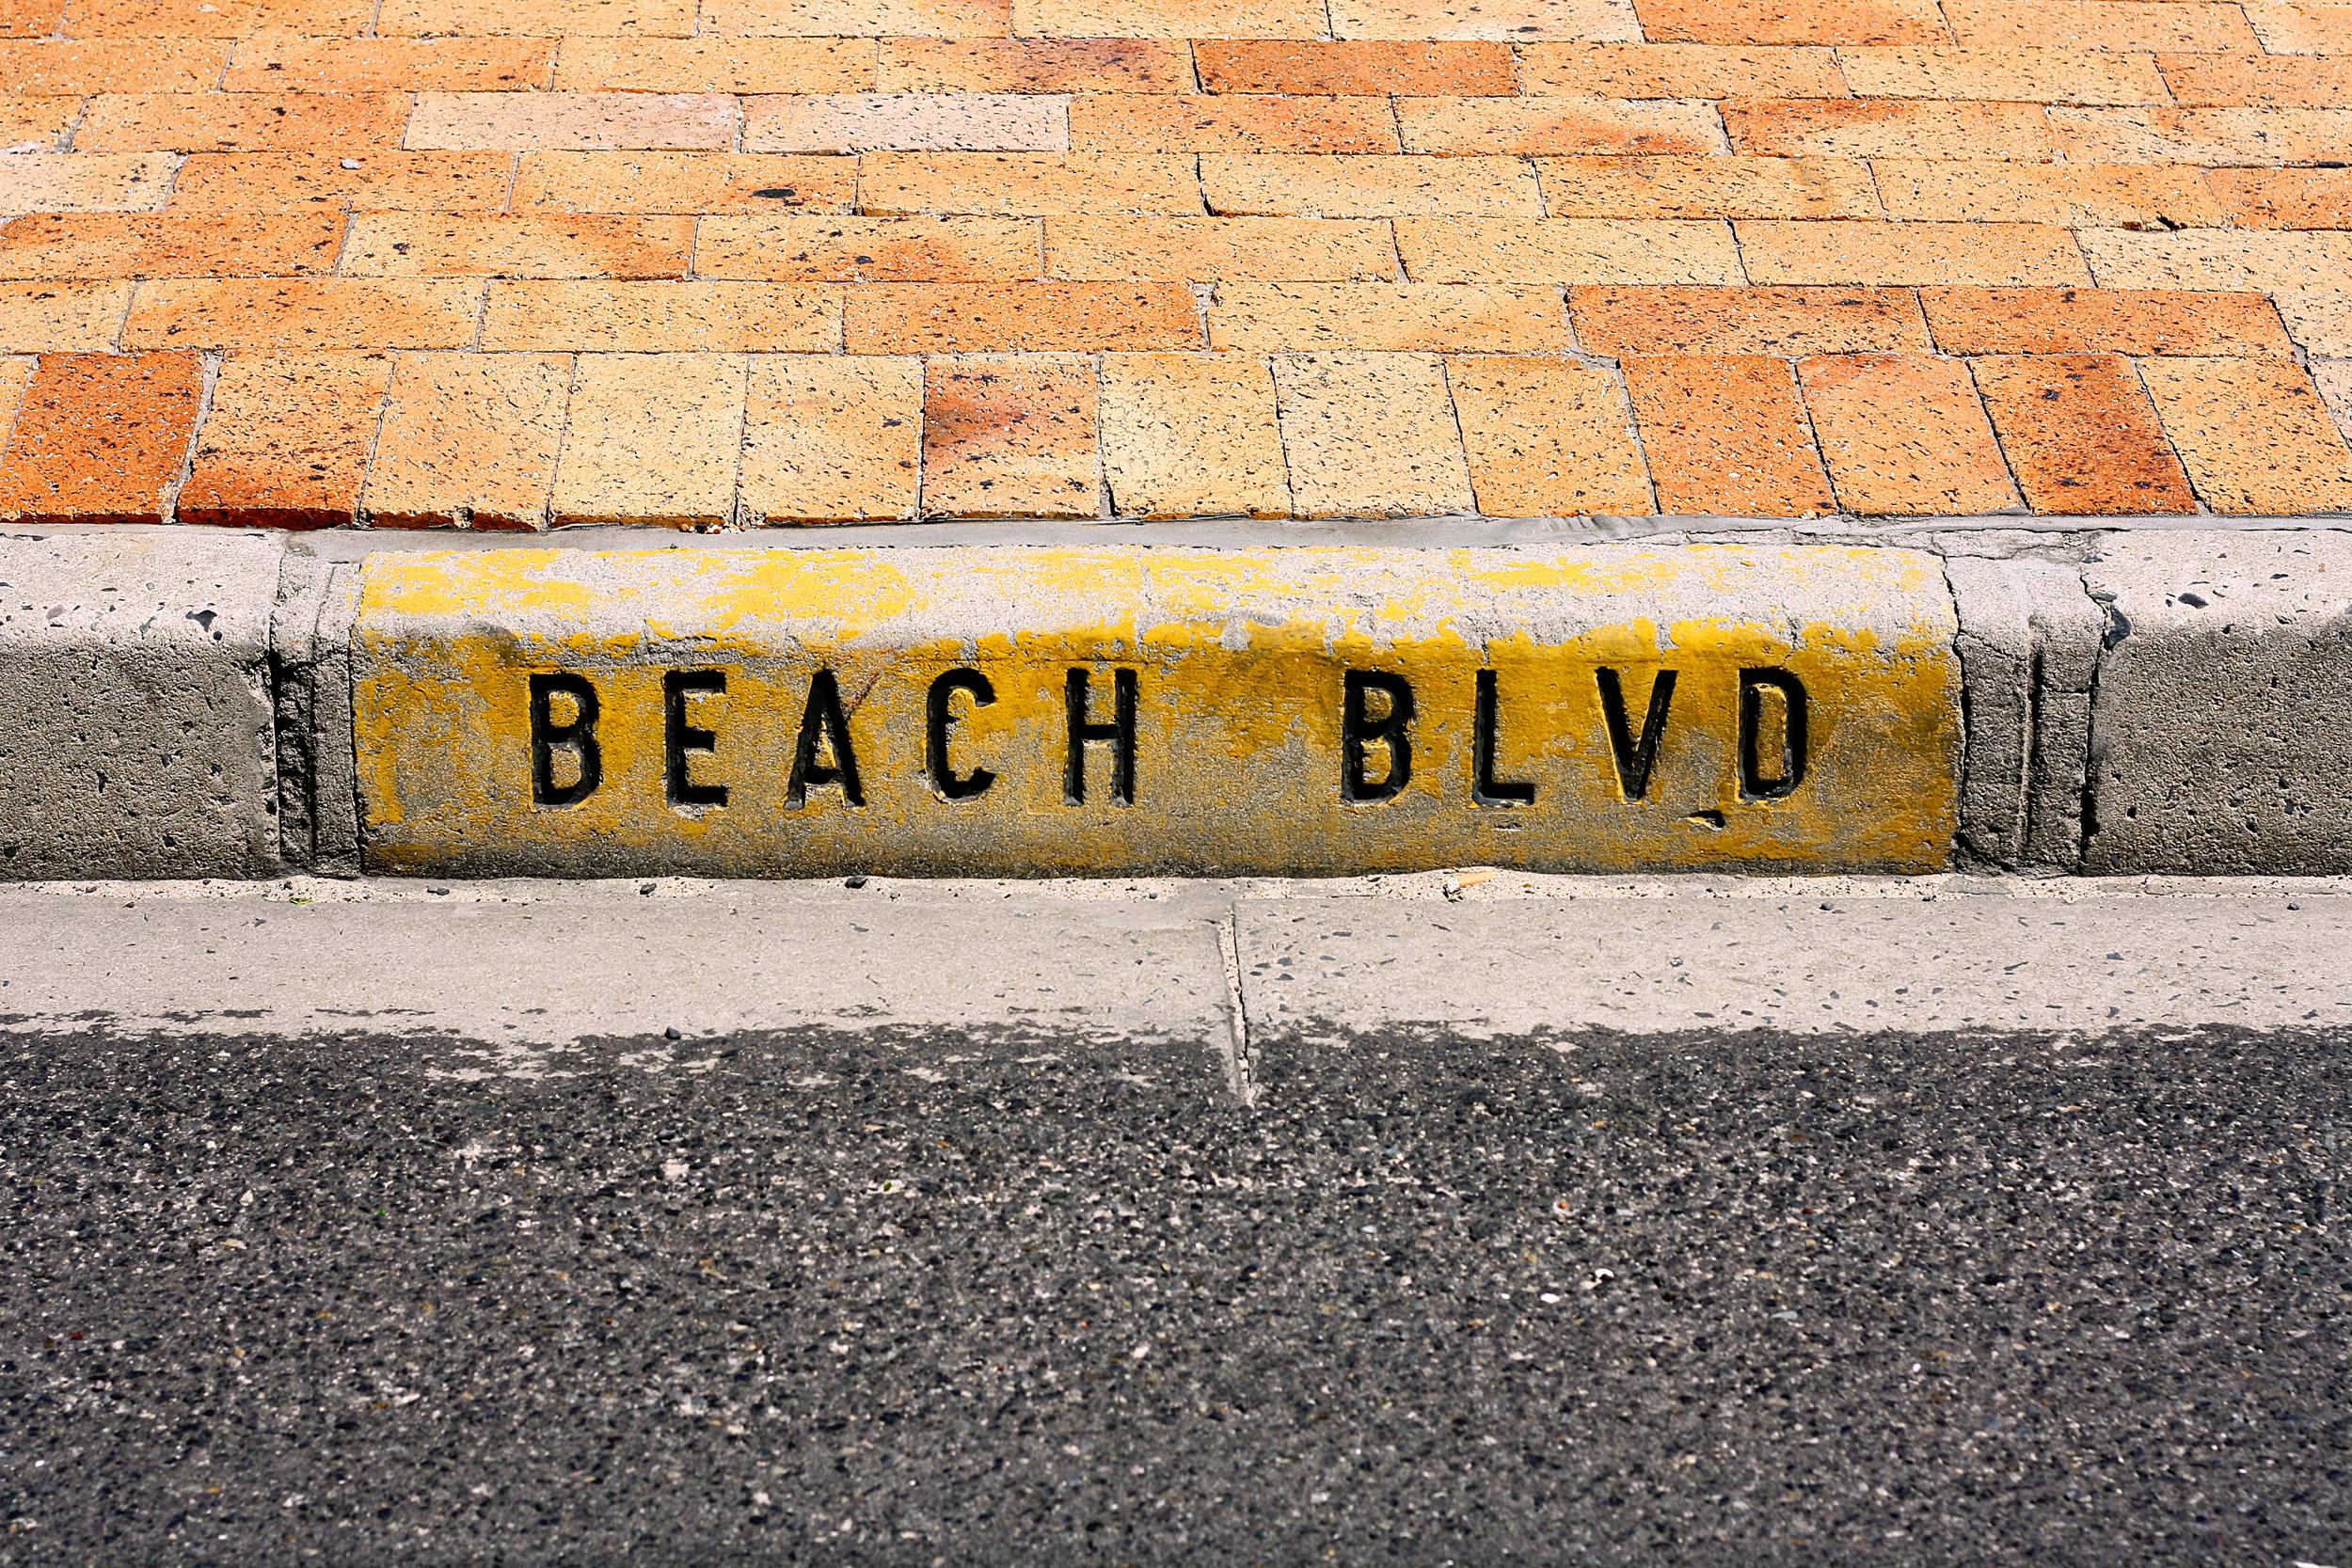 beach blvd bouvergstrand cape town south africa travel photographer.jpg